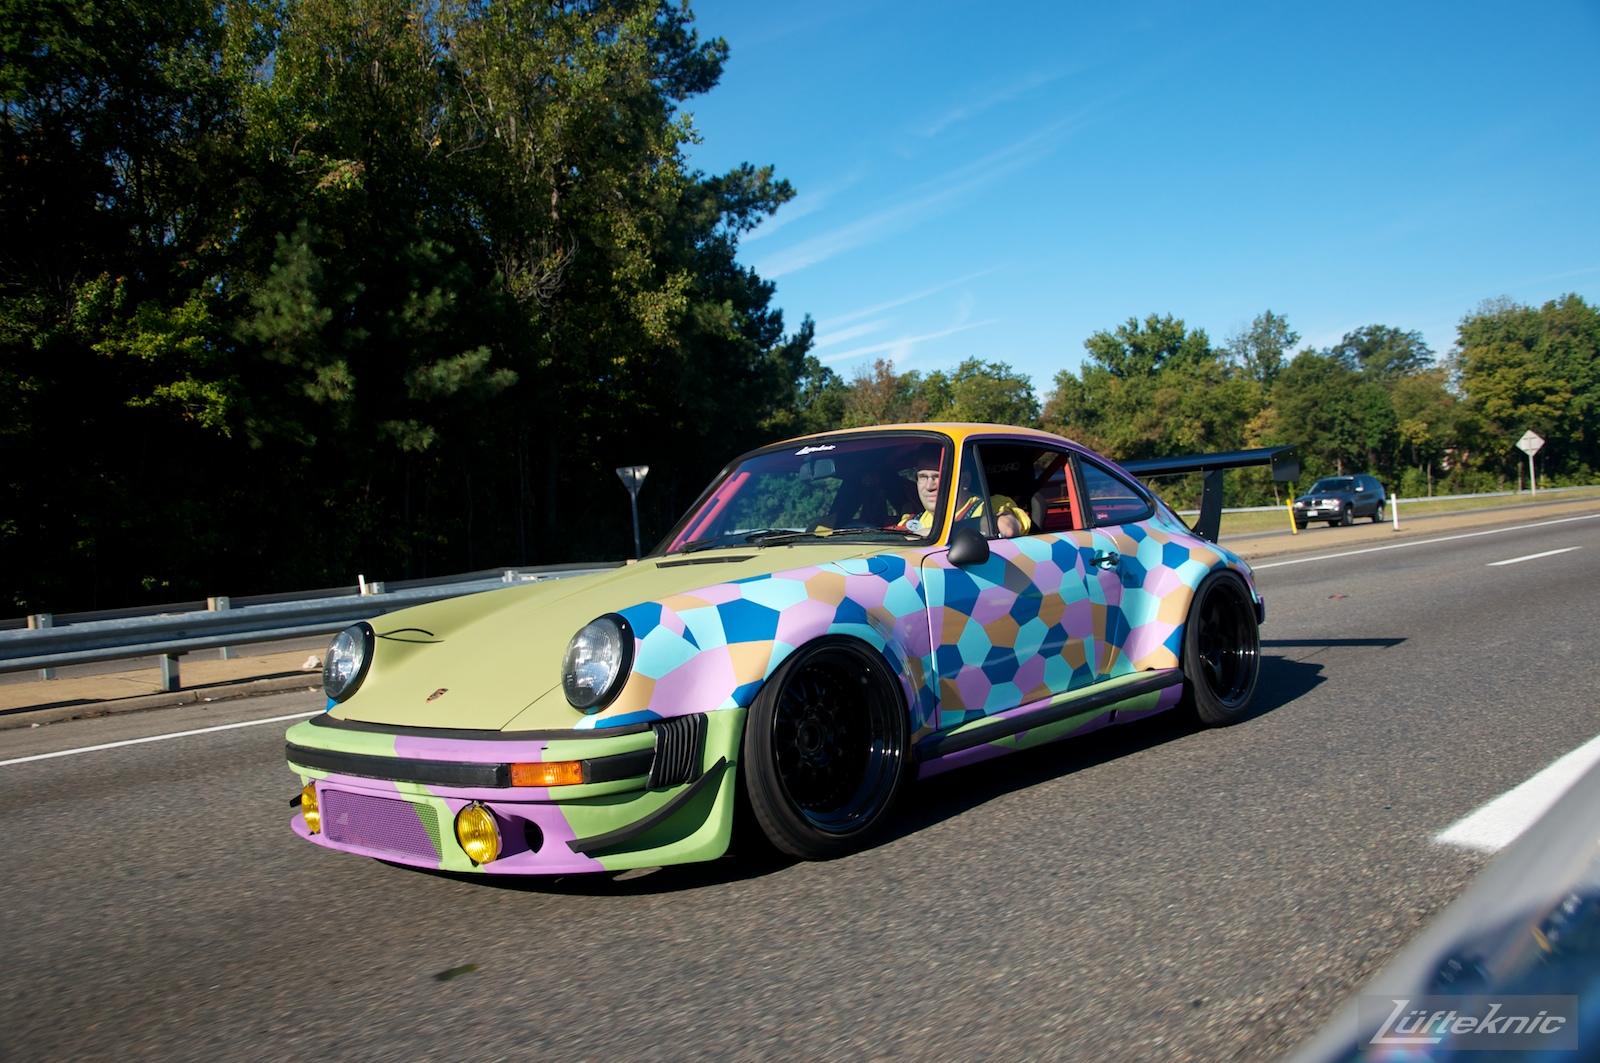 Lüfteknic #projectstuka Porsche 930 Turbo driving to h2o international car show.